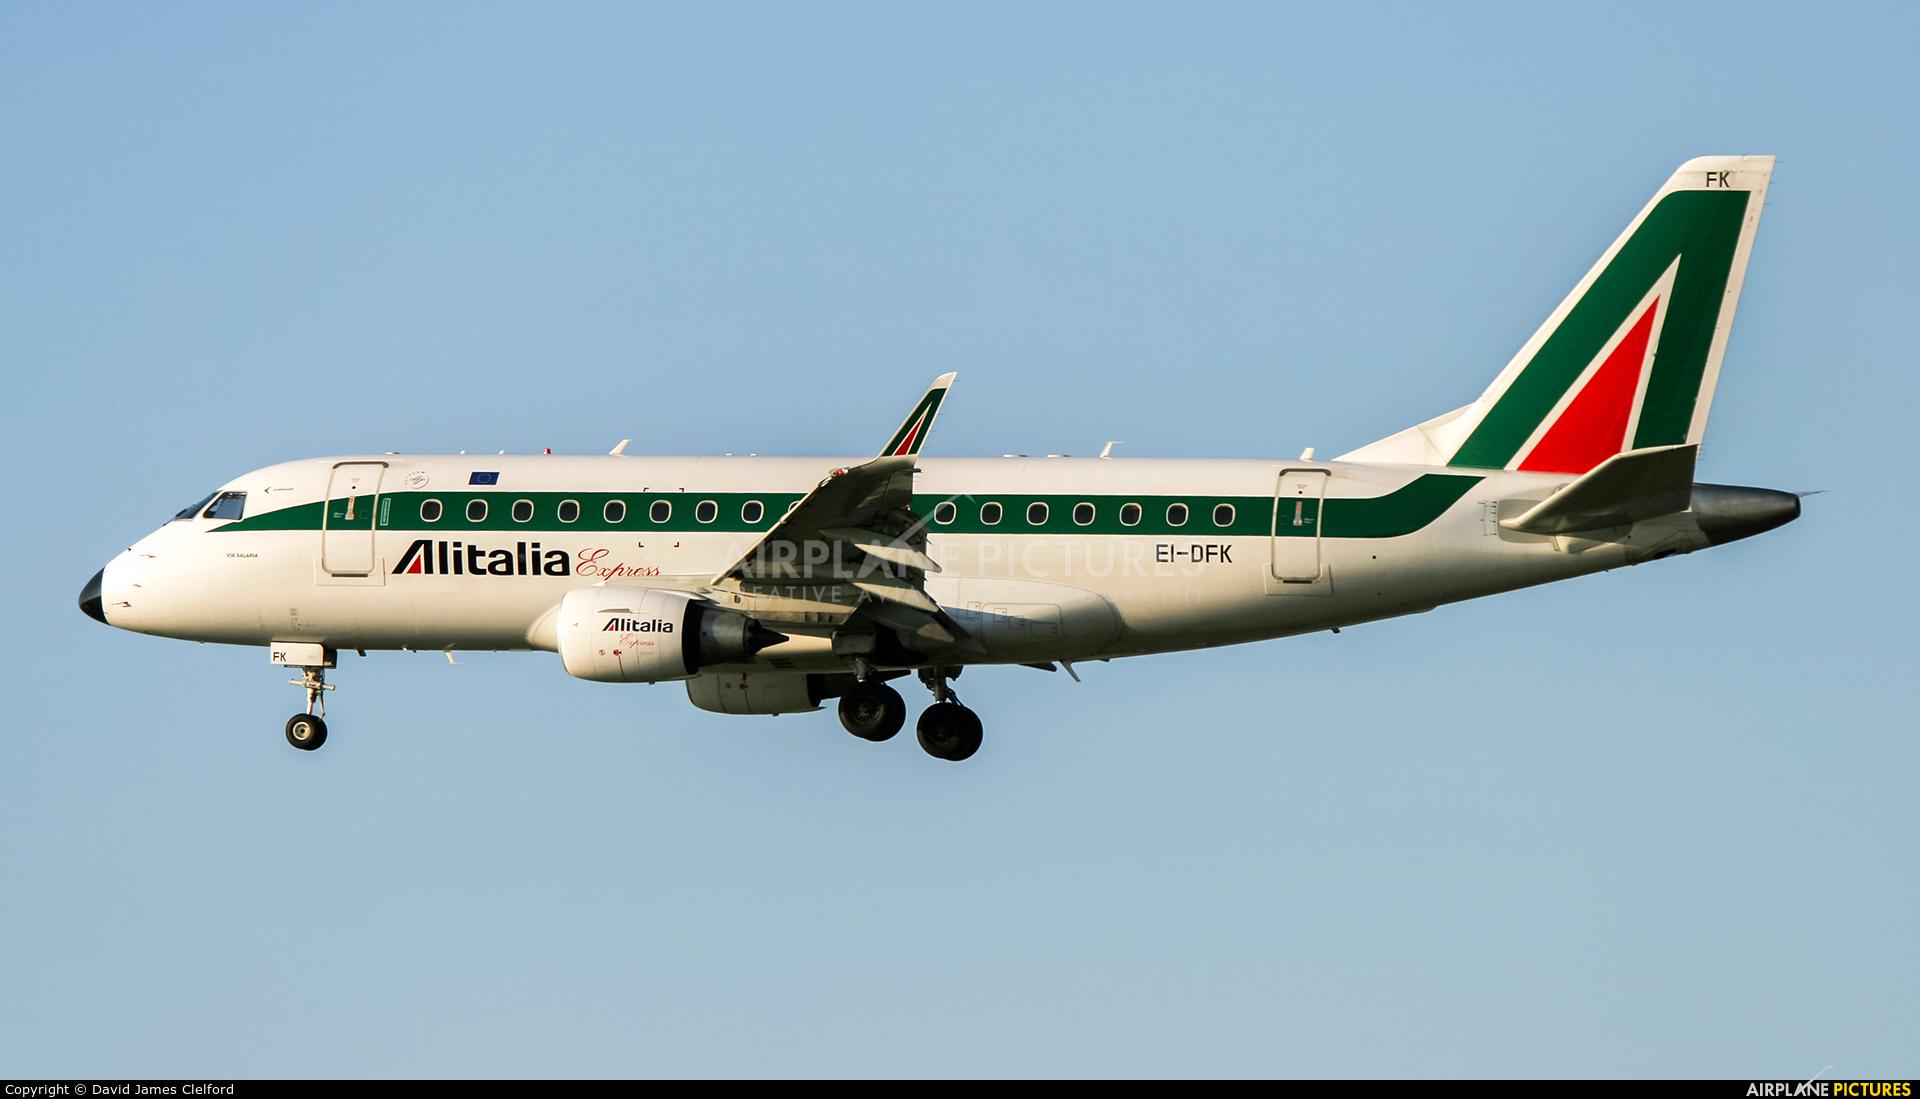 Alitalia Express EI-DFK aircraft at Frankfurt